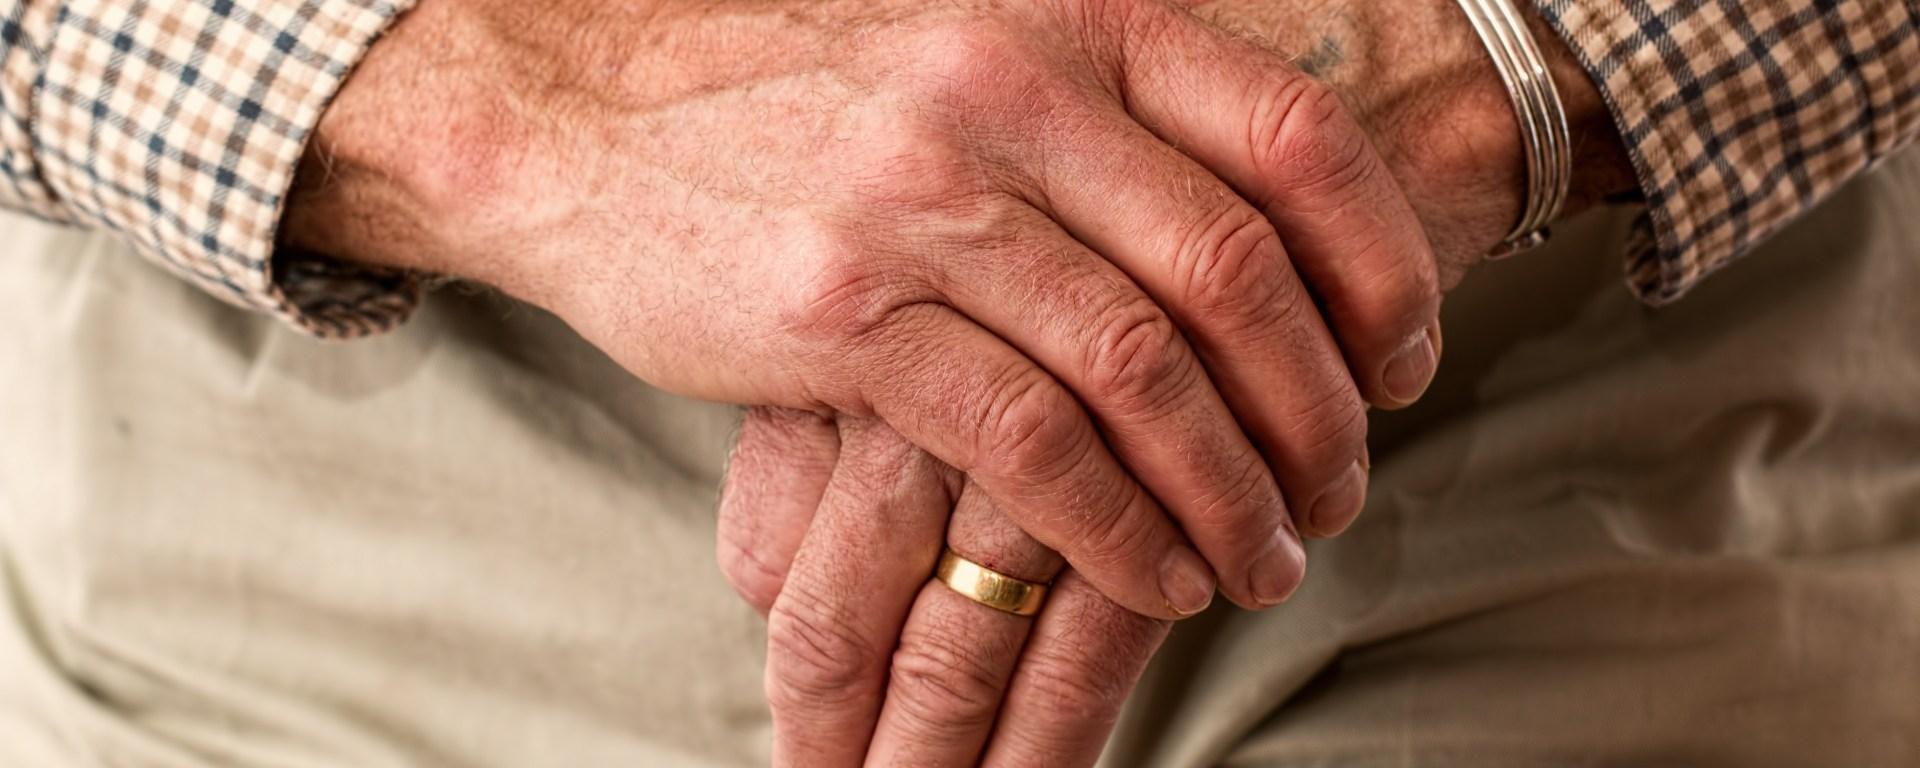 An elderly man's hands rest on top of a wooden cane.